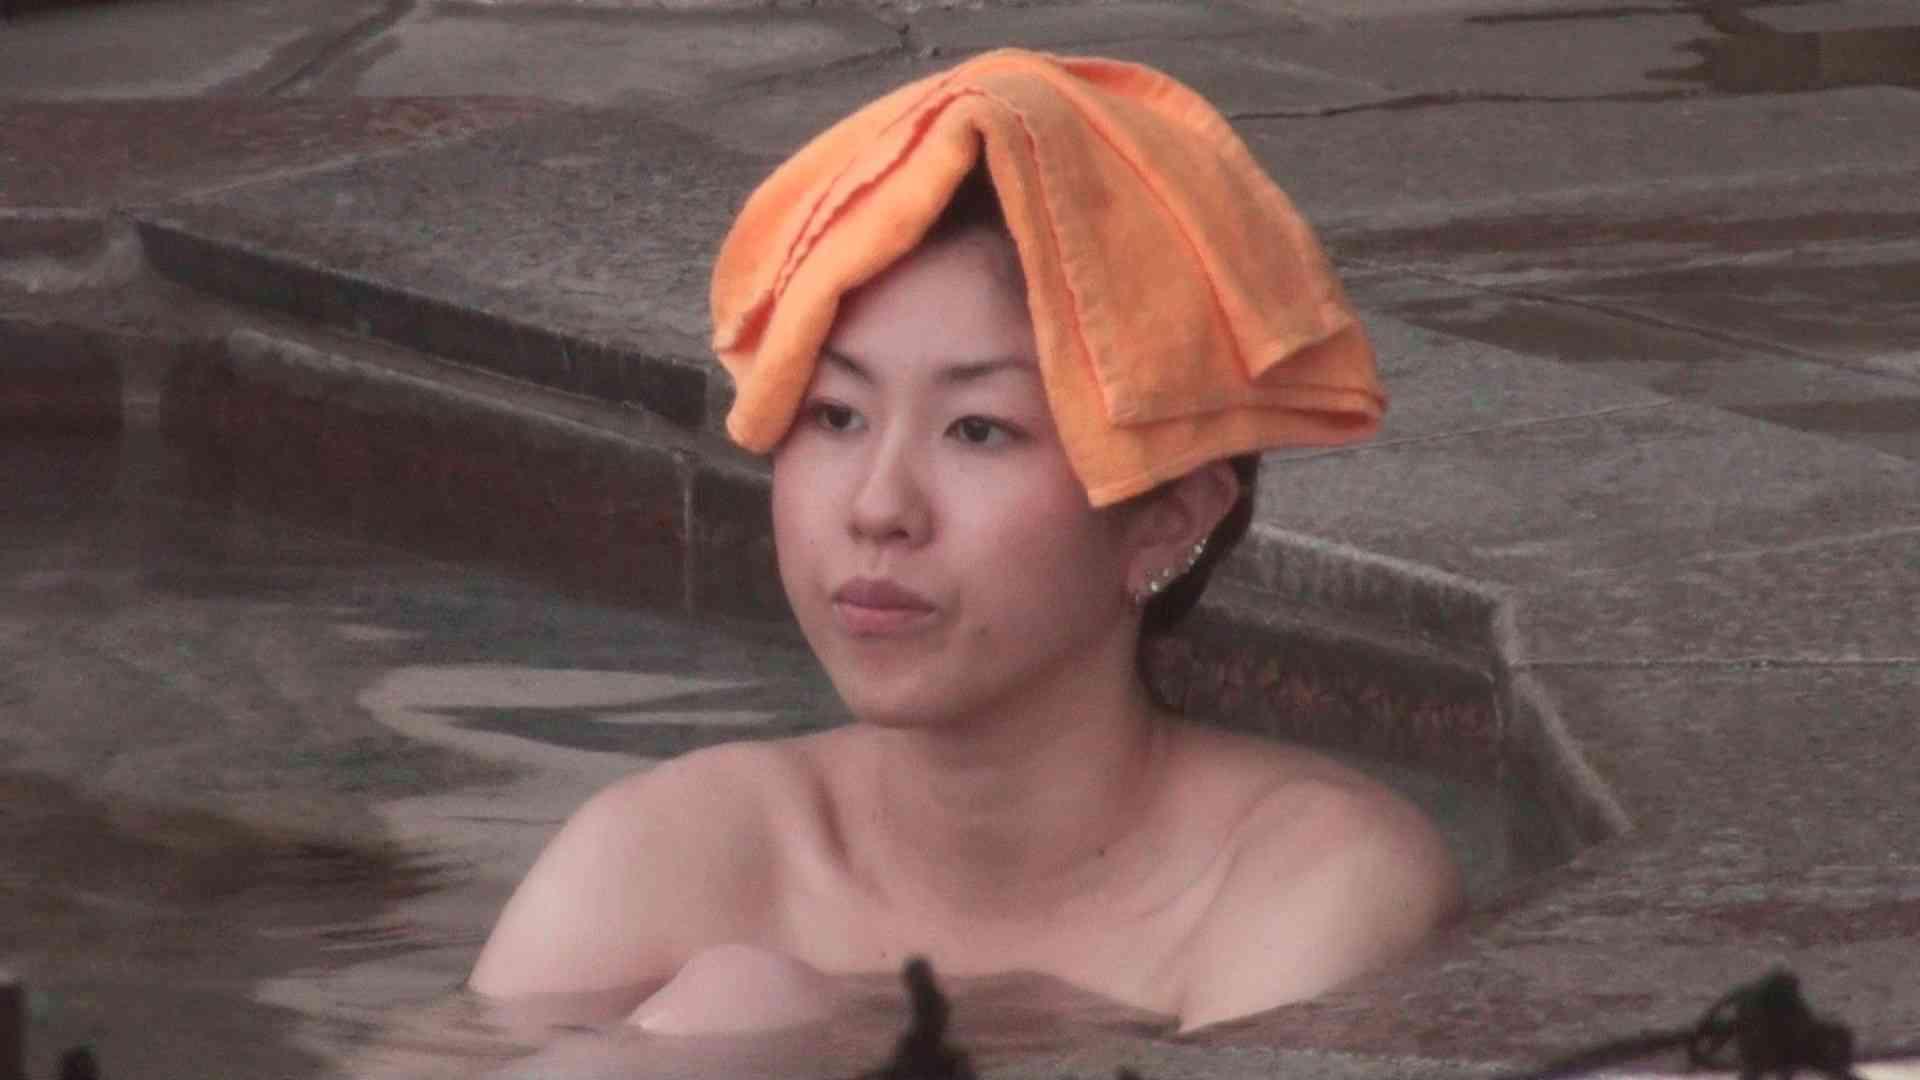 Aquaな露天風呂Vol.135 露天 AV無料動画キャプチャ 67連発 59